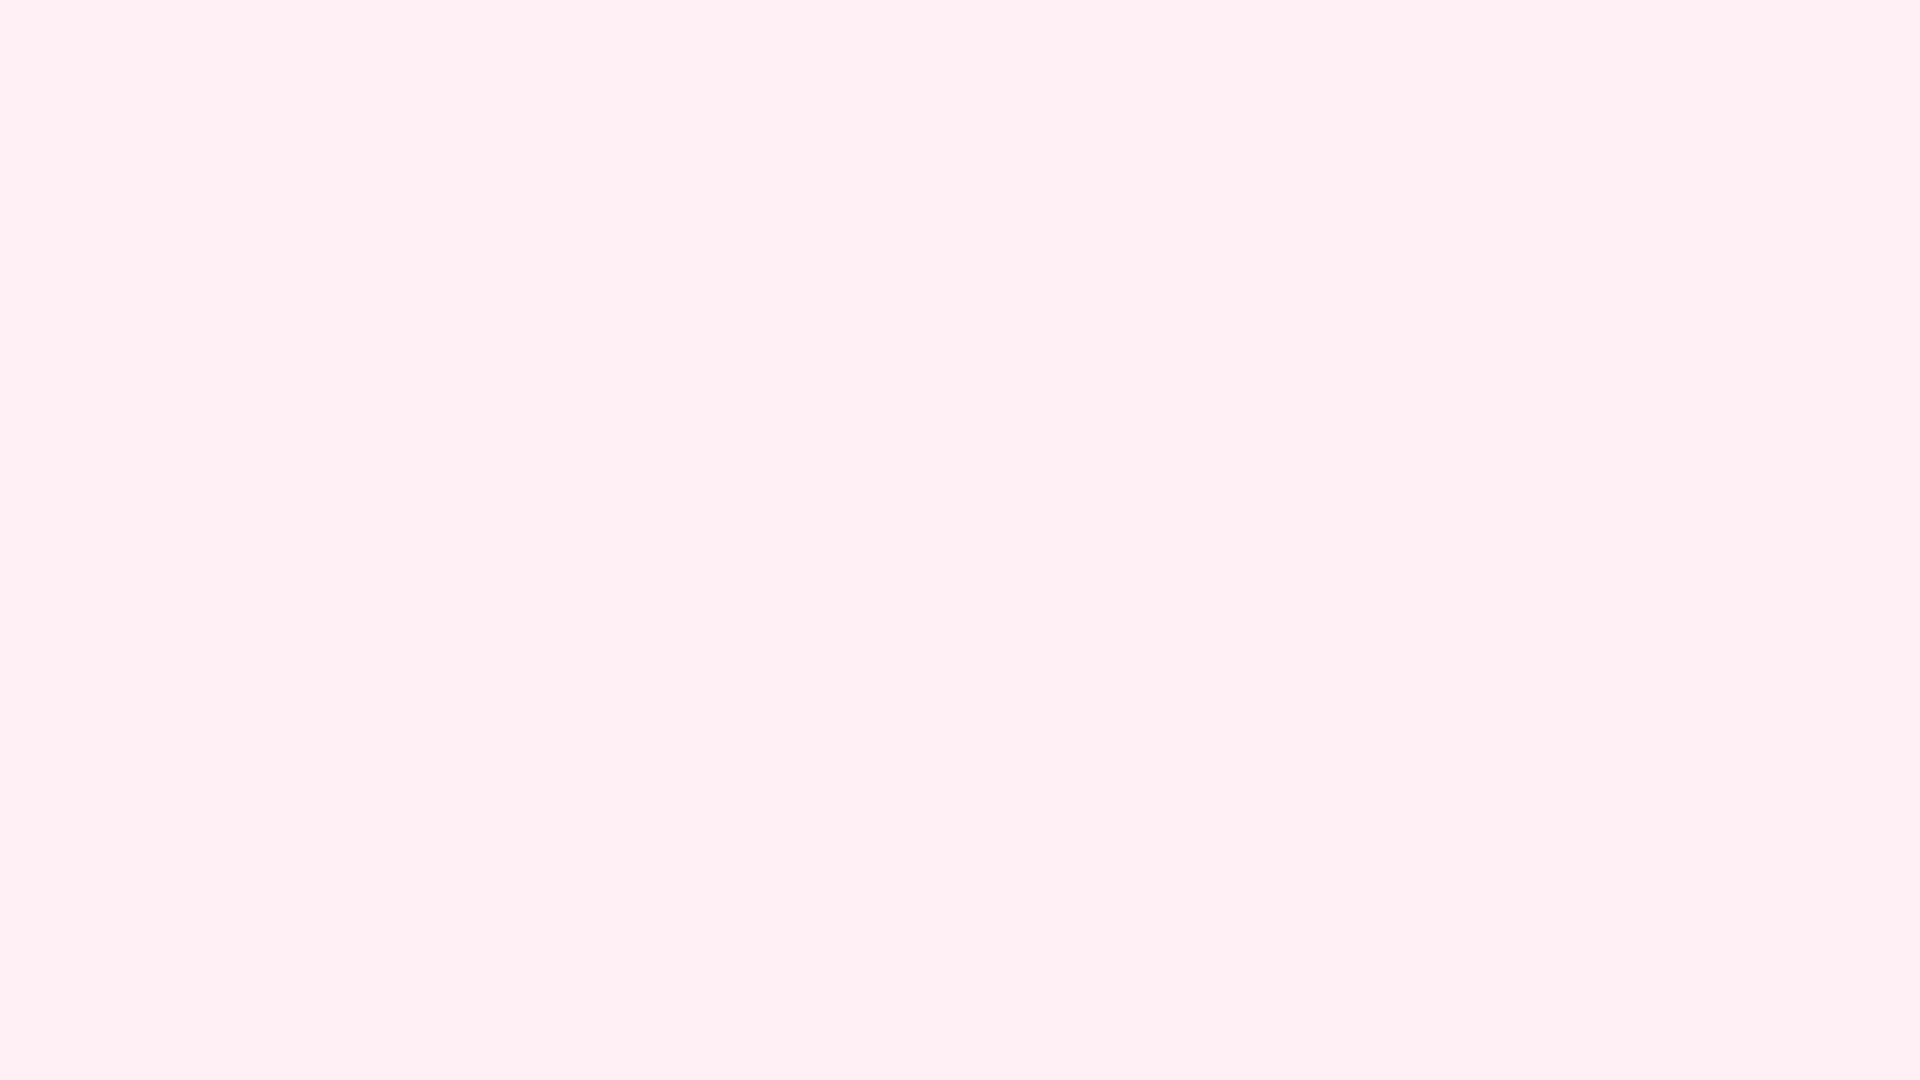 1920x1080 Lavender Blush Solid Color Background